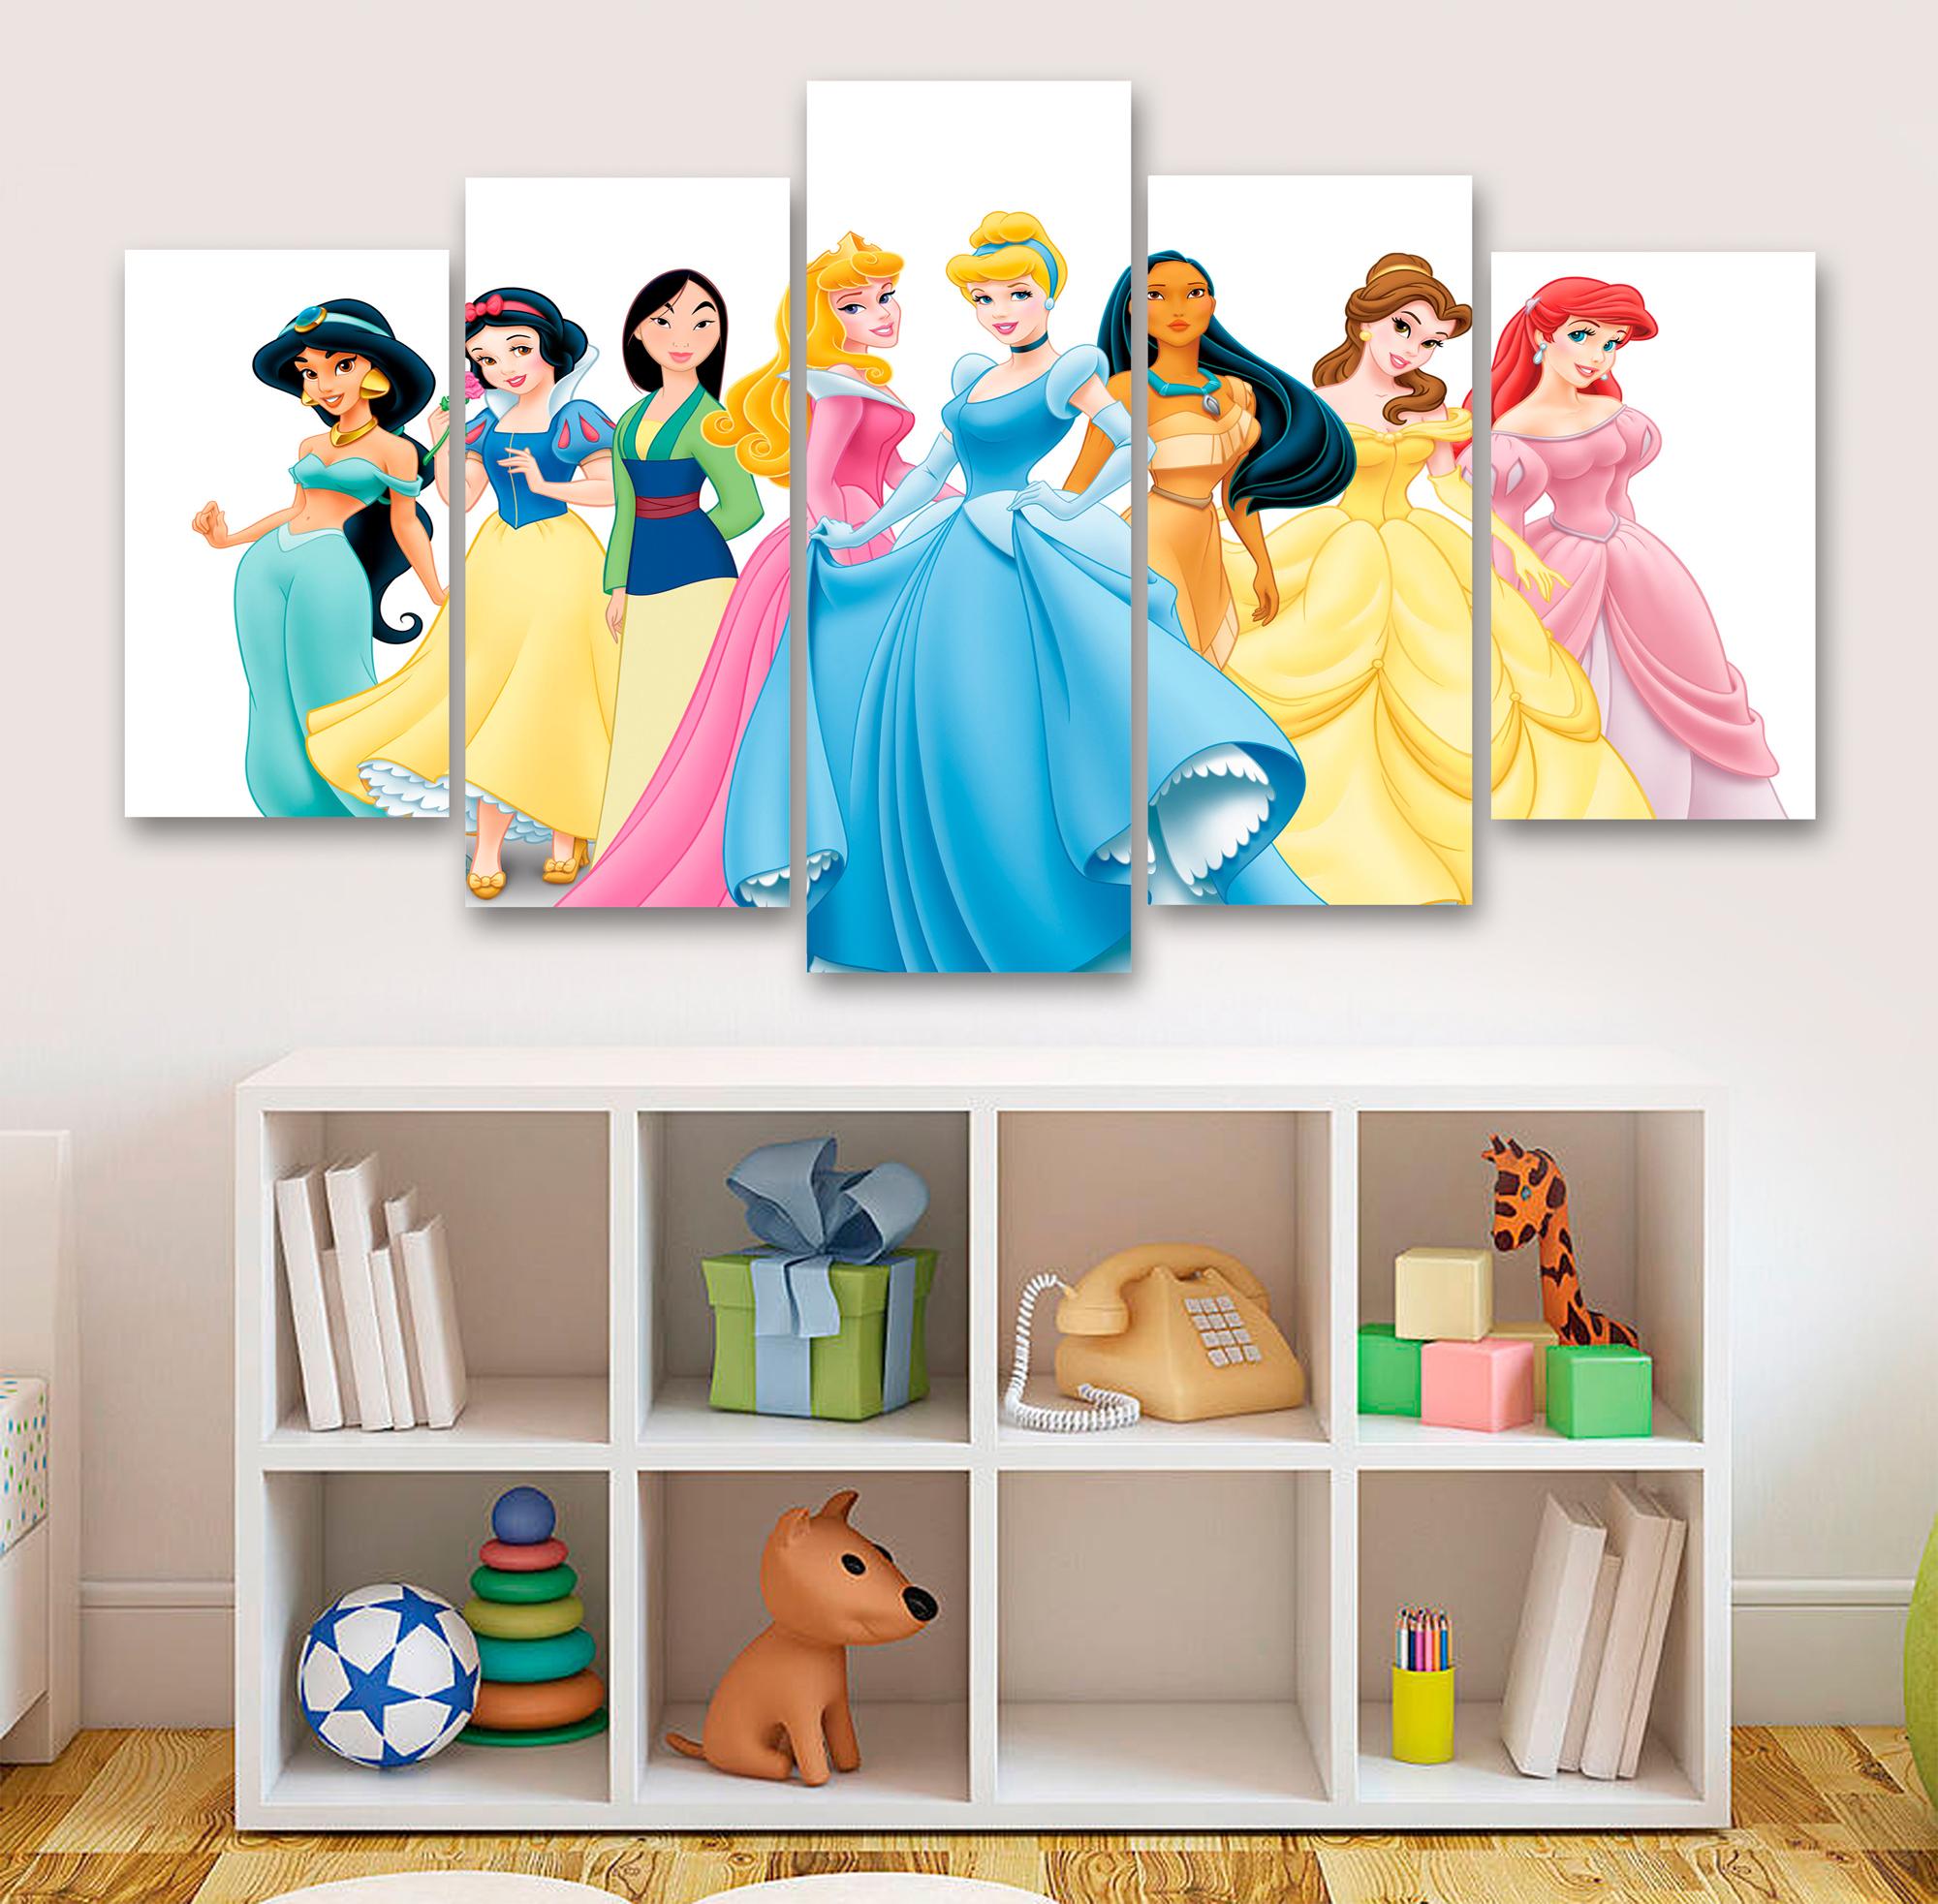 Disney Princesses 5 Piece Canvas, Multi Panel Canvas, Home Decor Bedroom  Decor, Office Decor 032 sold by PrintBoxGB